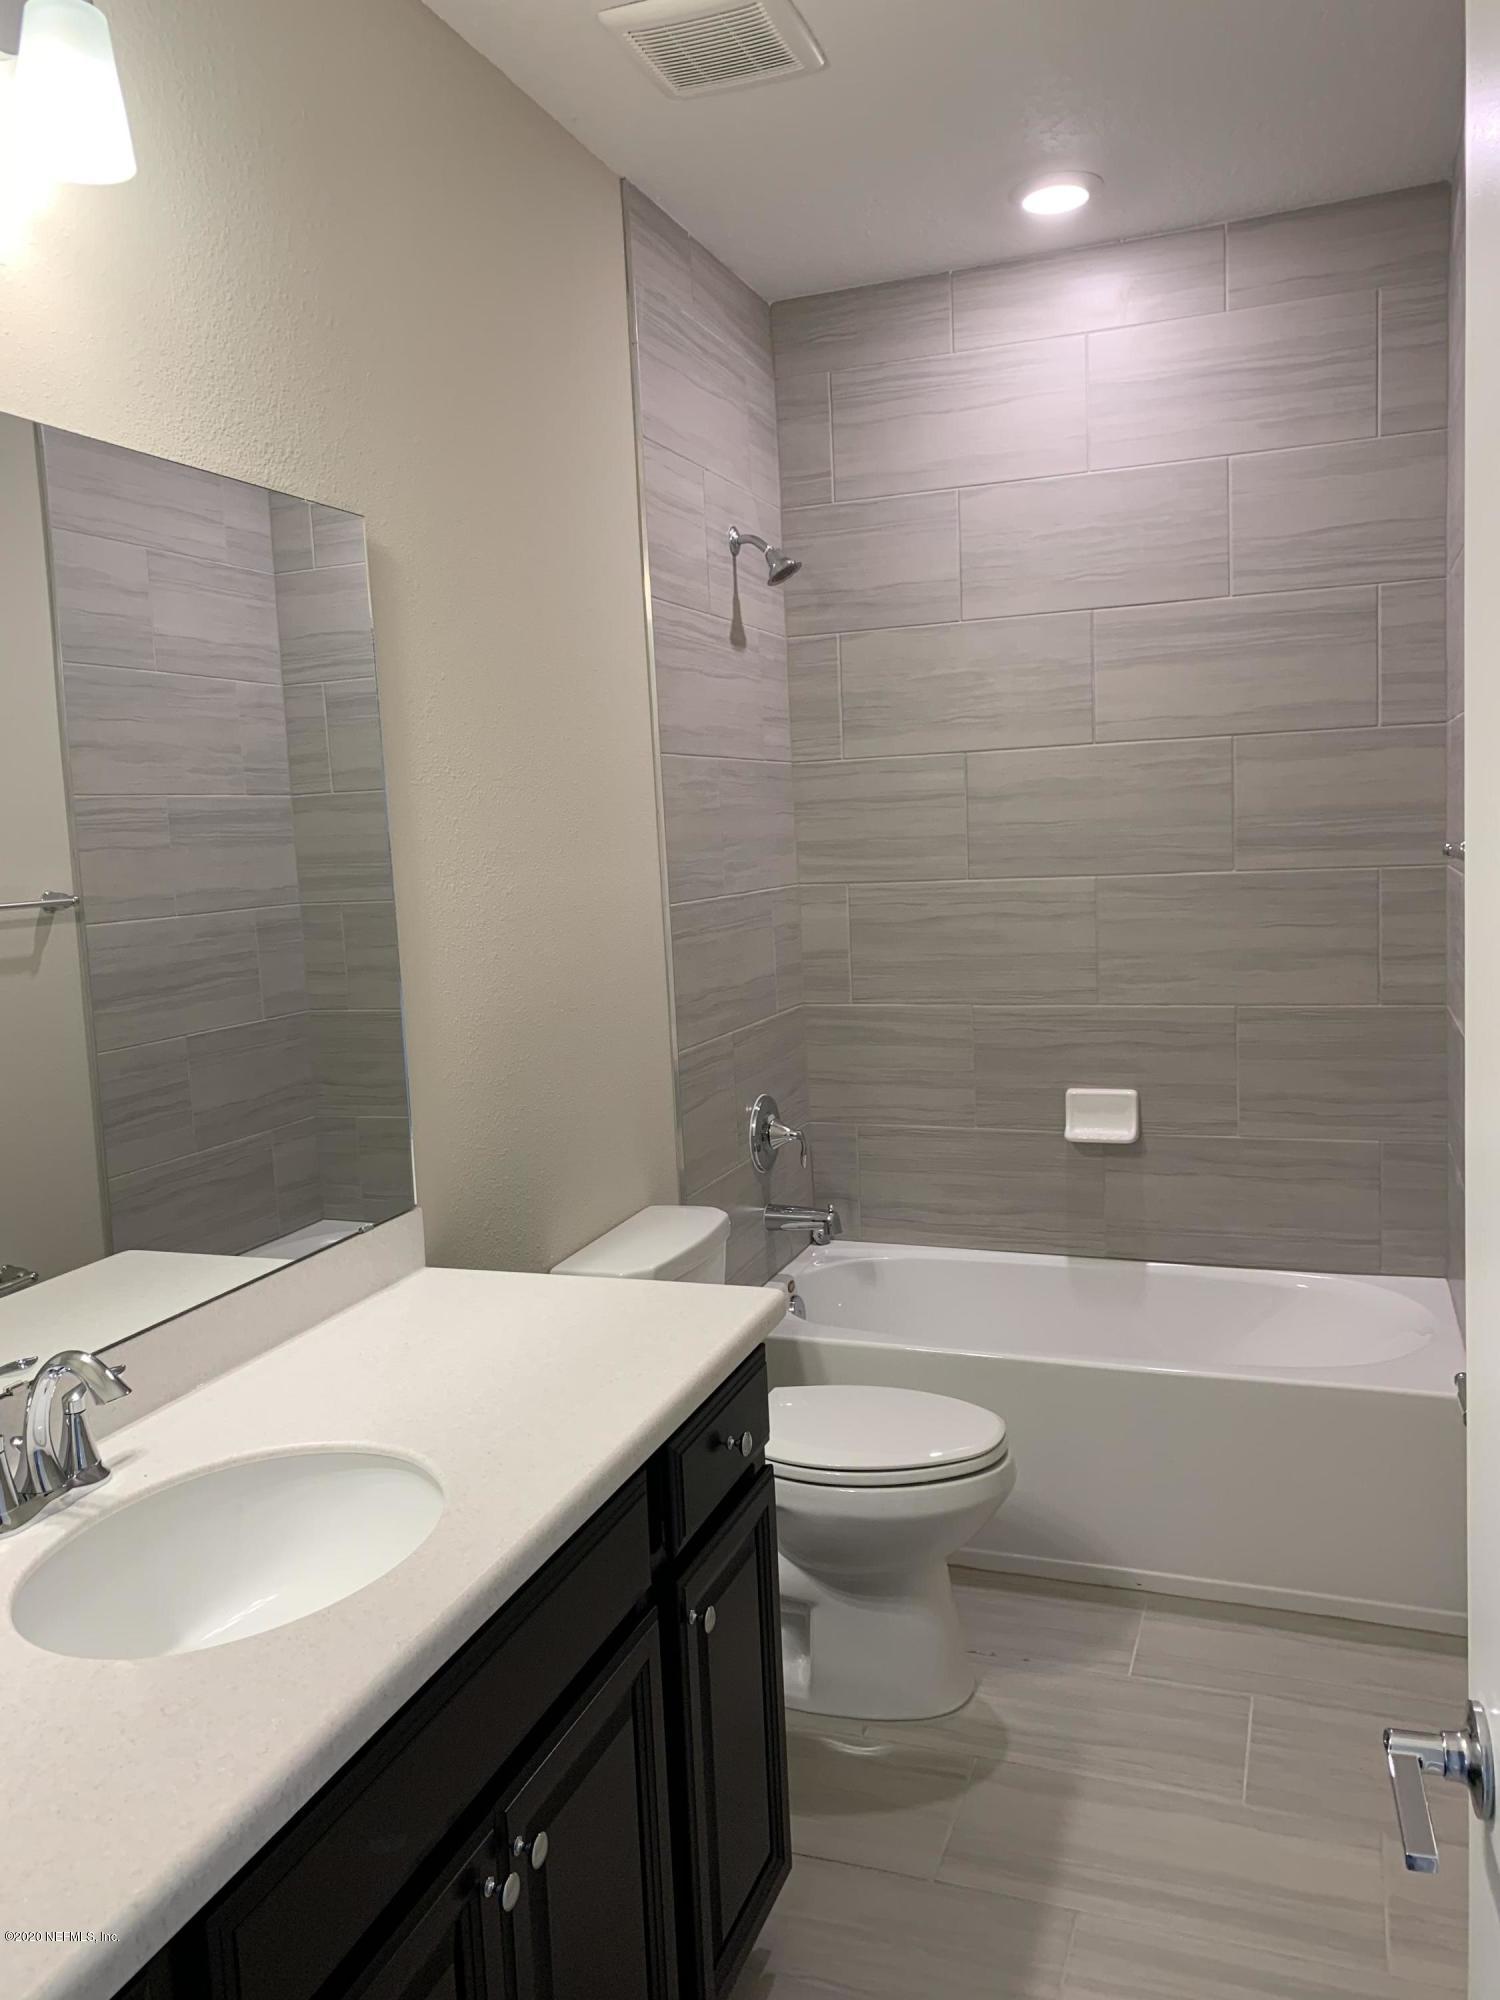 188 LATROBE, ST AUGUSTINE, FLORIDA 32095, 3 Bedrooms Bedrooms, ,2 BathroomsBathrooms,Residential,For sale,LATROBE,1056554